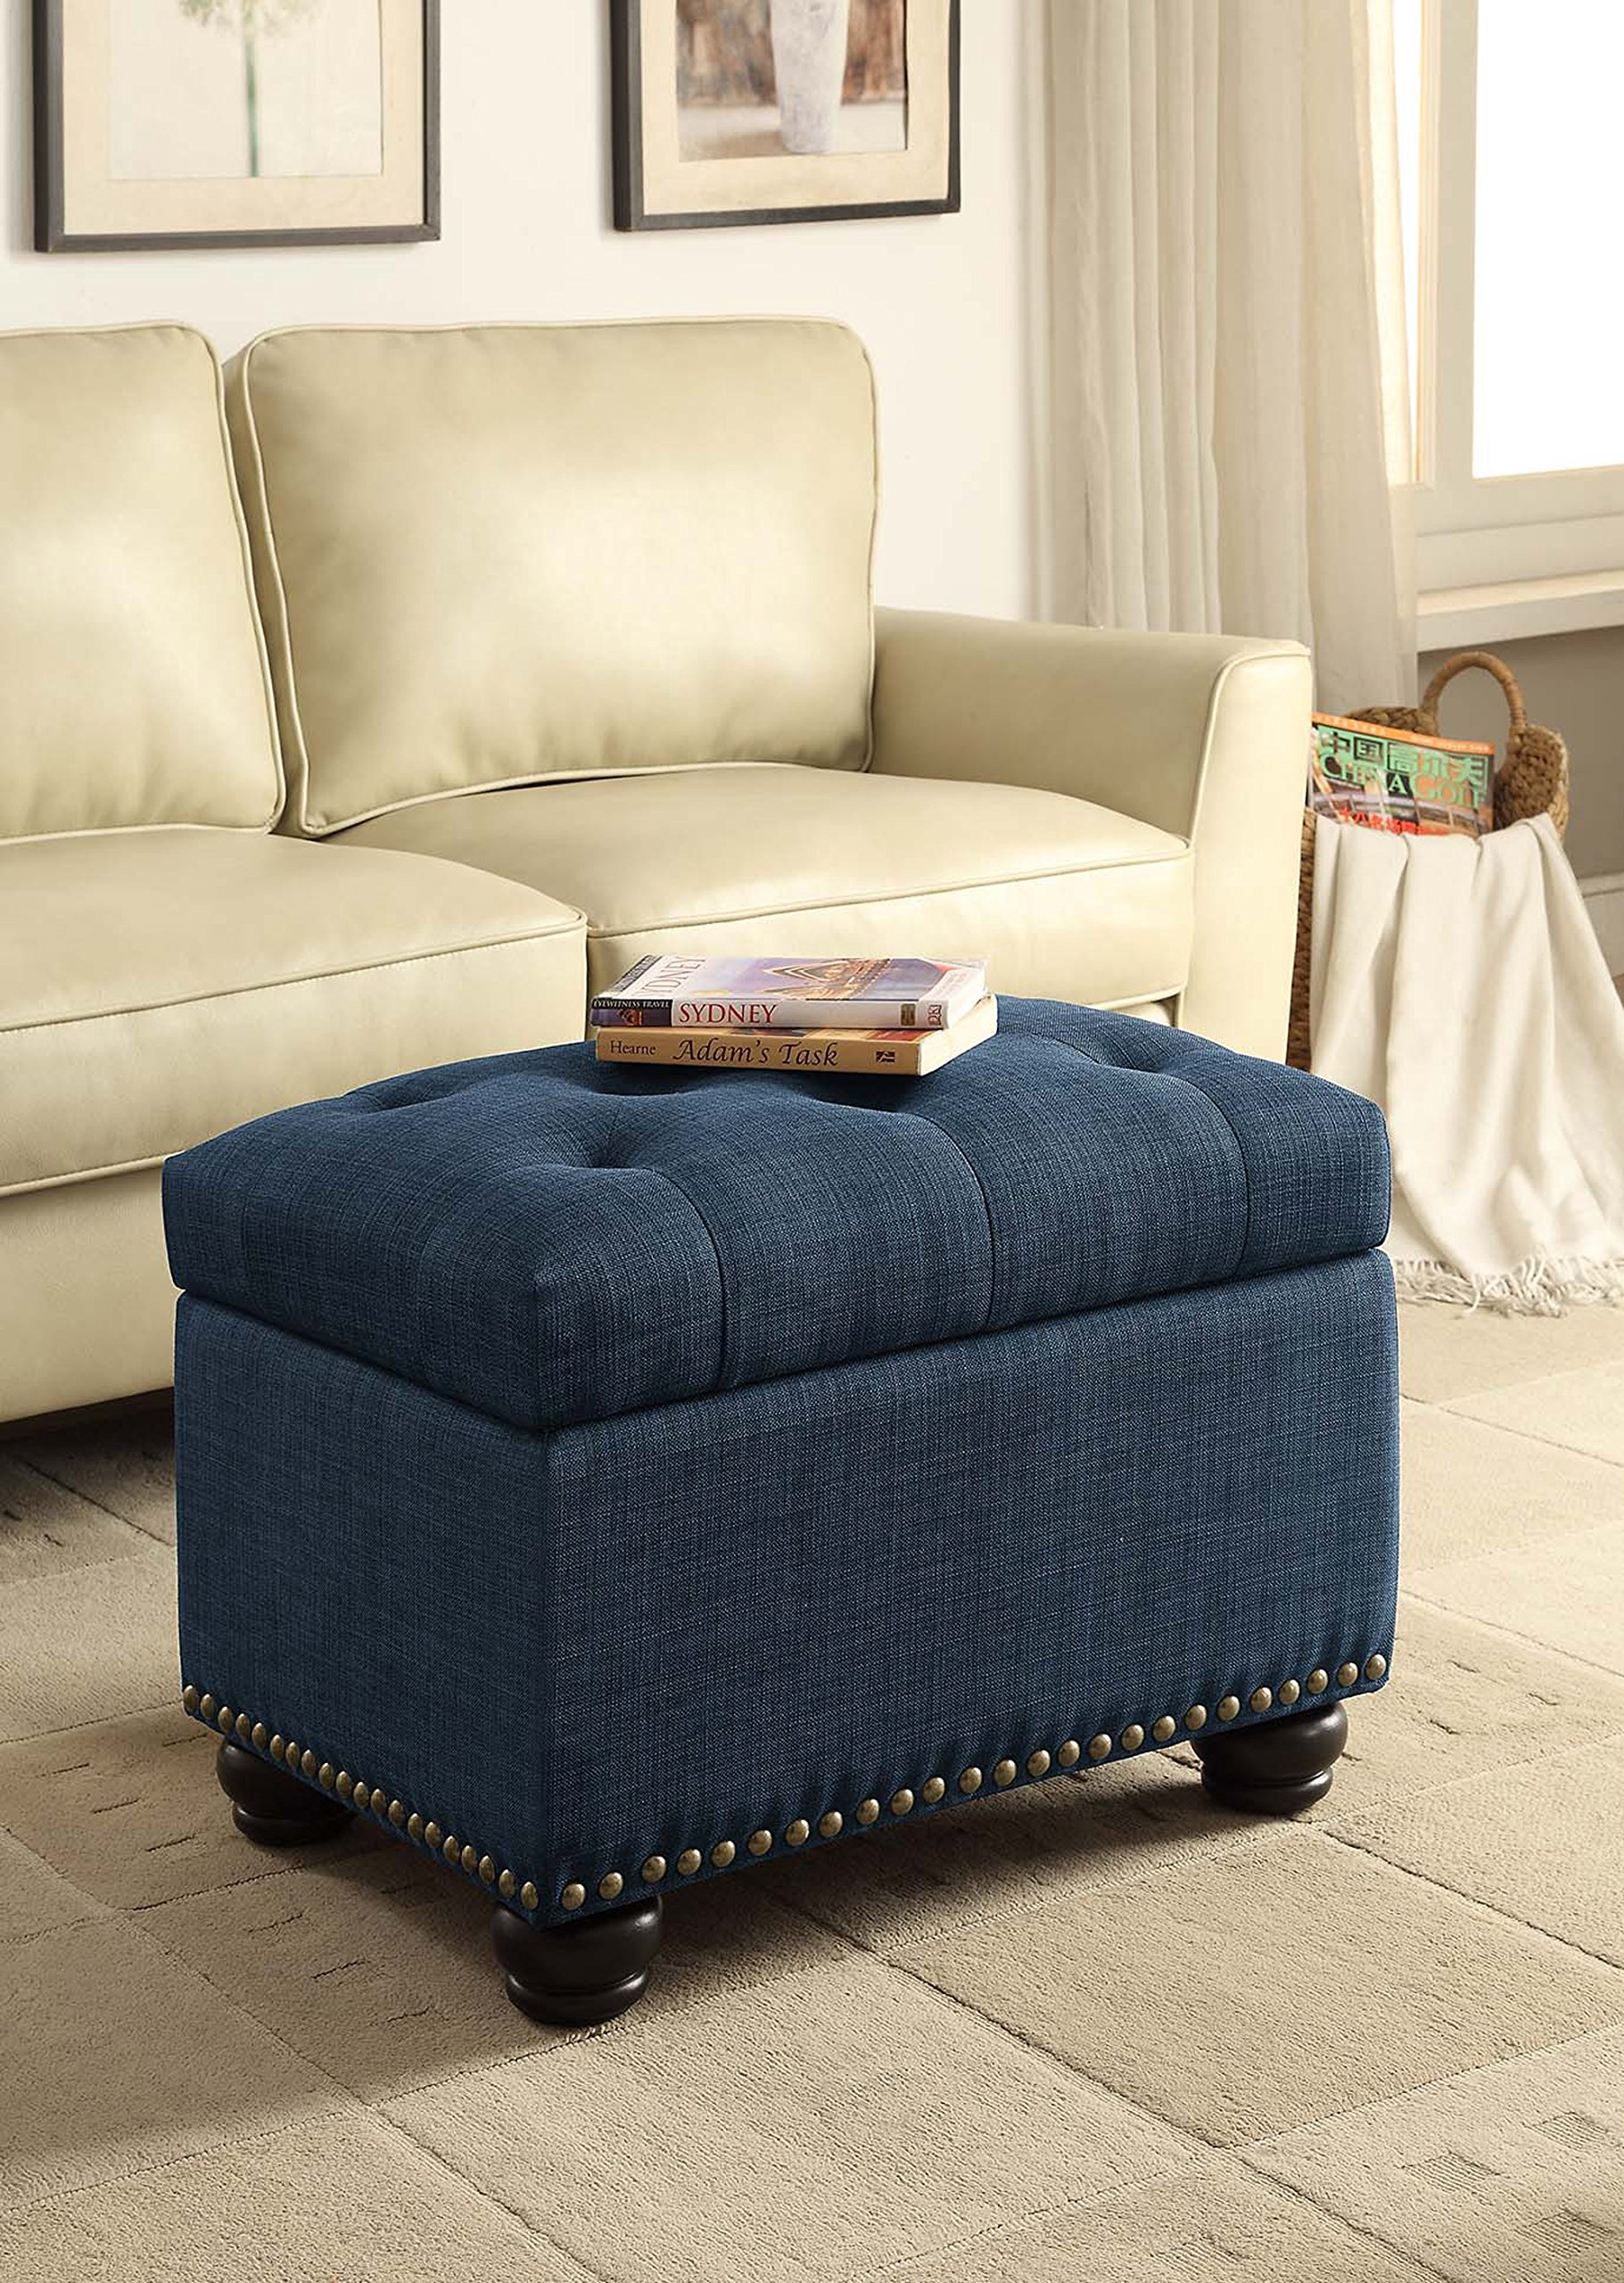 Convenience Concepts Designs4Comfort 5th Avenue Storage Ottoman, Blue by Convenience Concepts (Image #4)